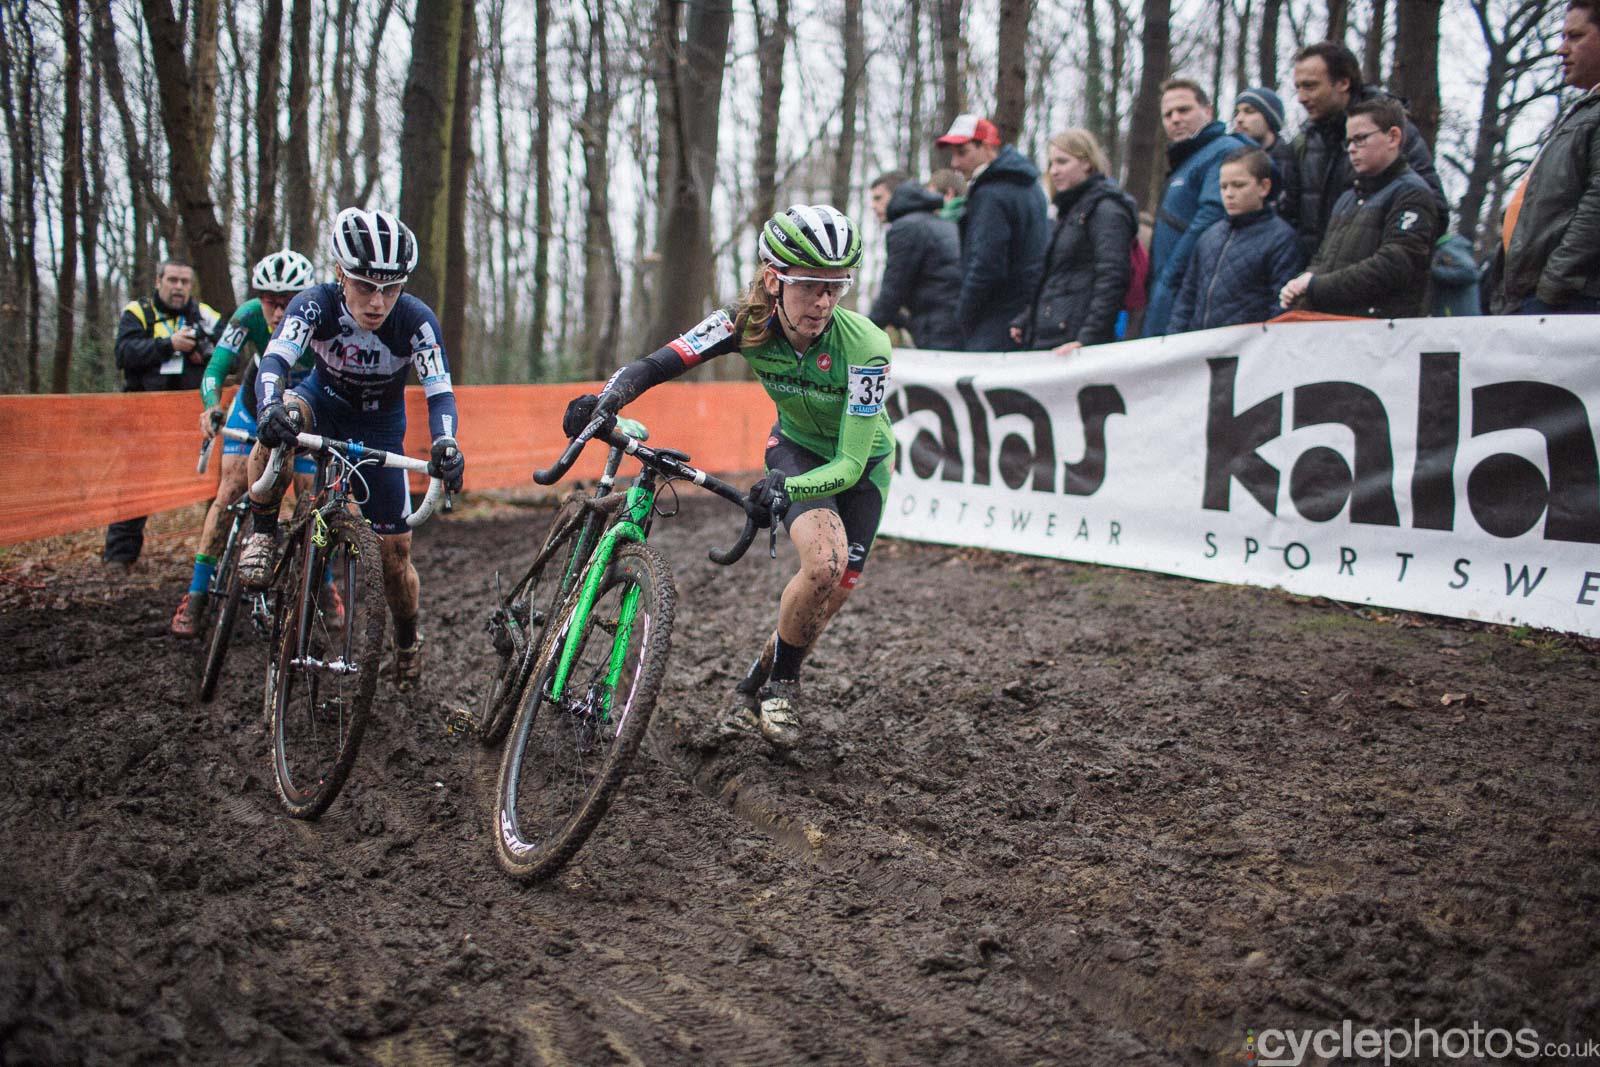 2016-cyclephotos-cyclocross-hoogerheide-134543-katie-antonneau